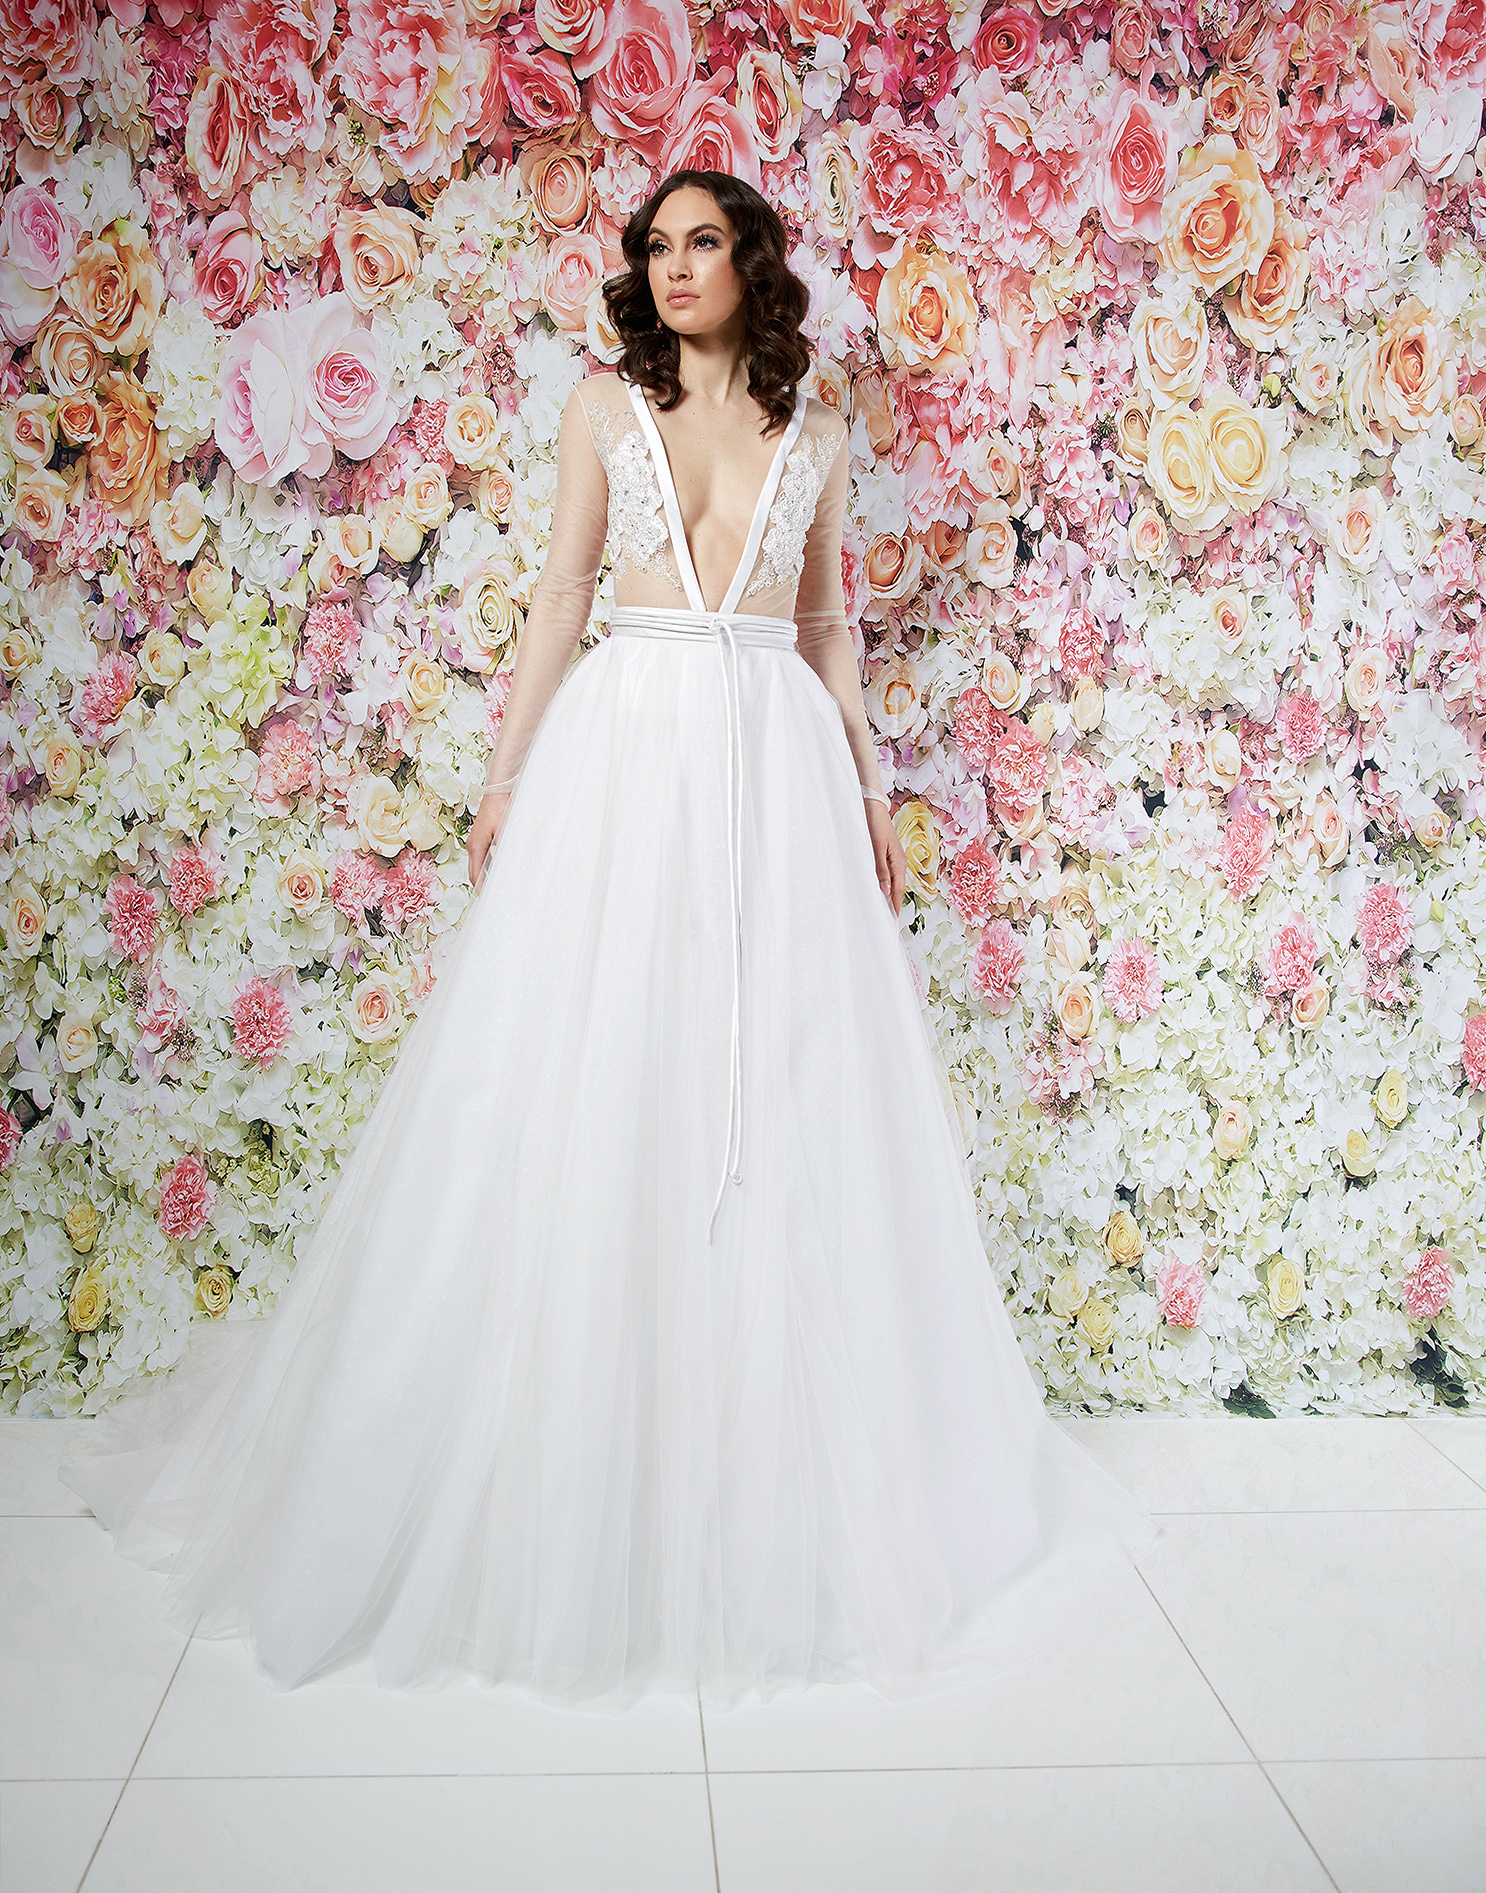 randi rahm wedding dress spring 2019 tulle ball gown sheer bodice